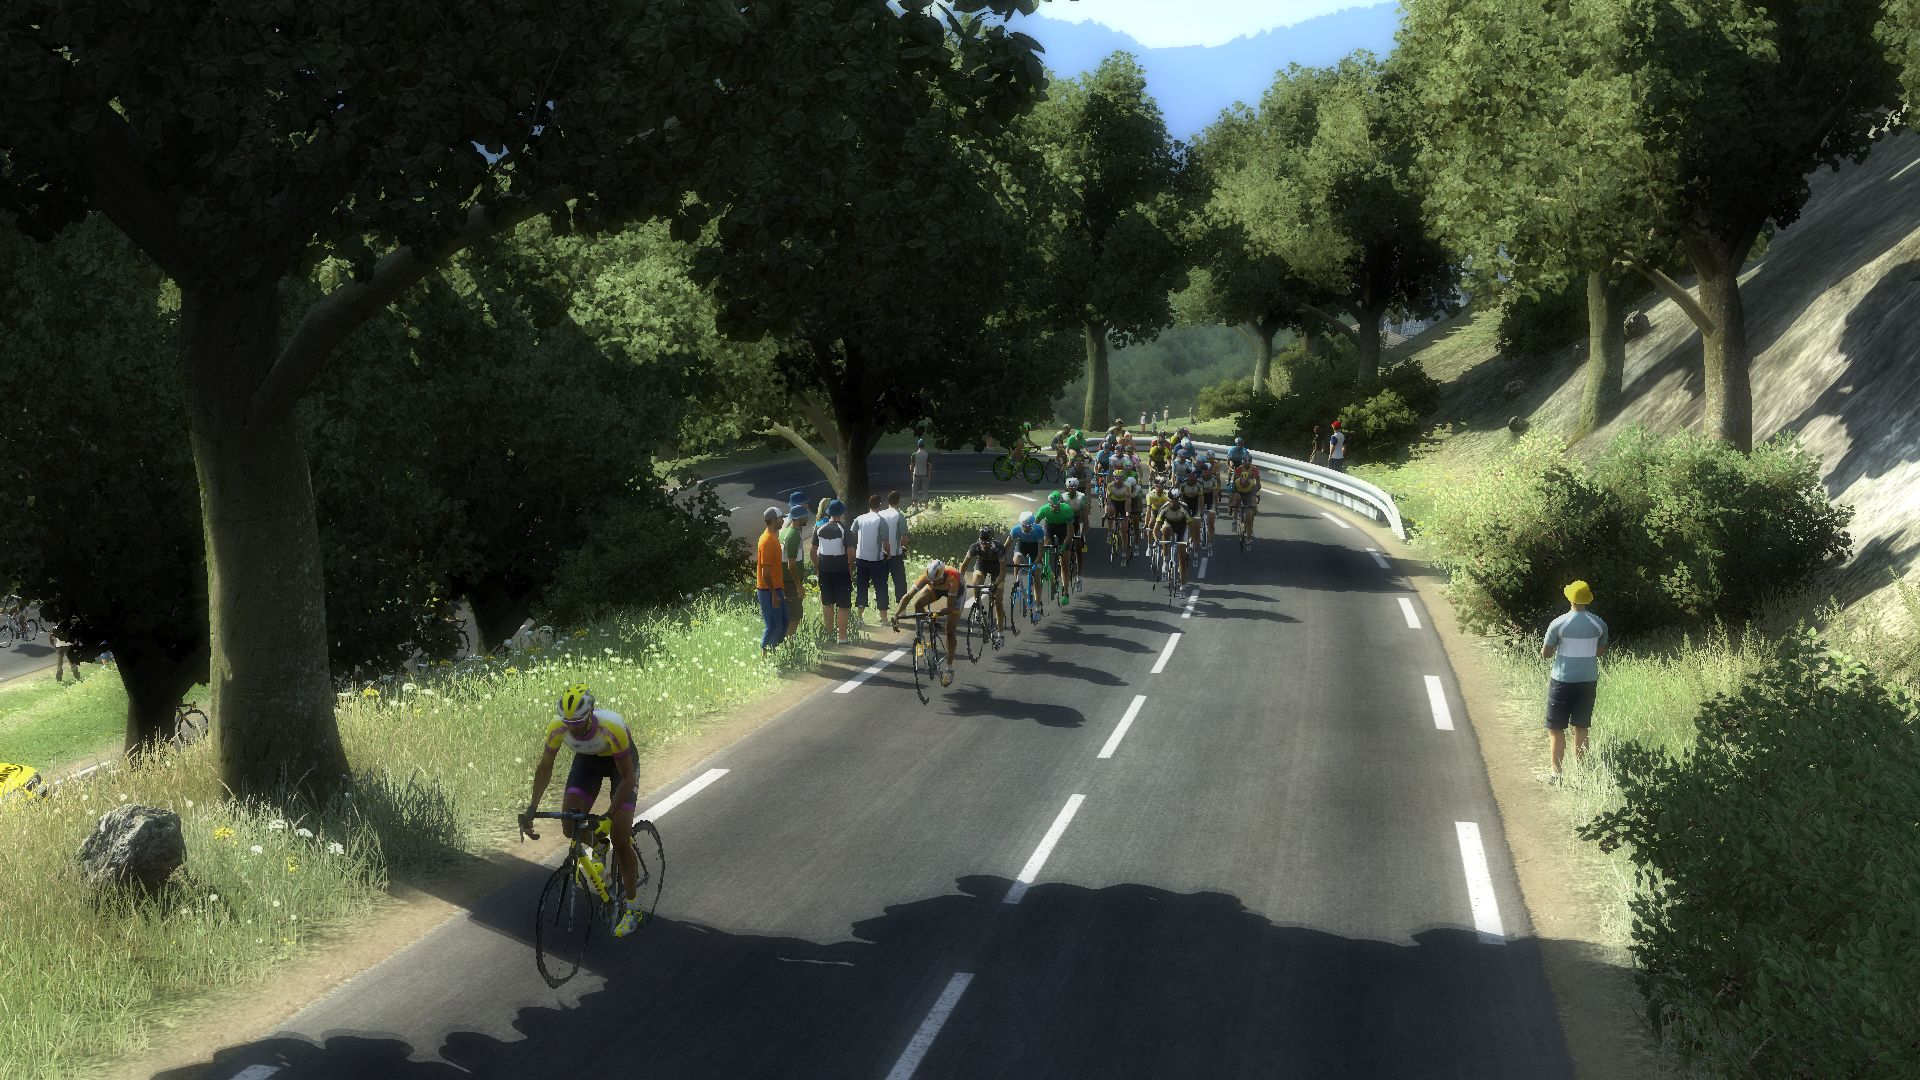 pcmdaily.com/images/mg/2017/Races/U23/Avenir/AVES7%202.jpg